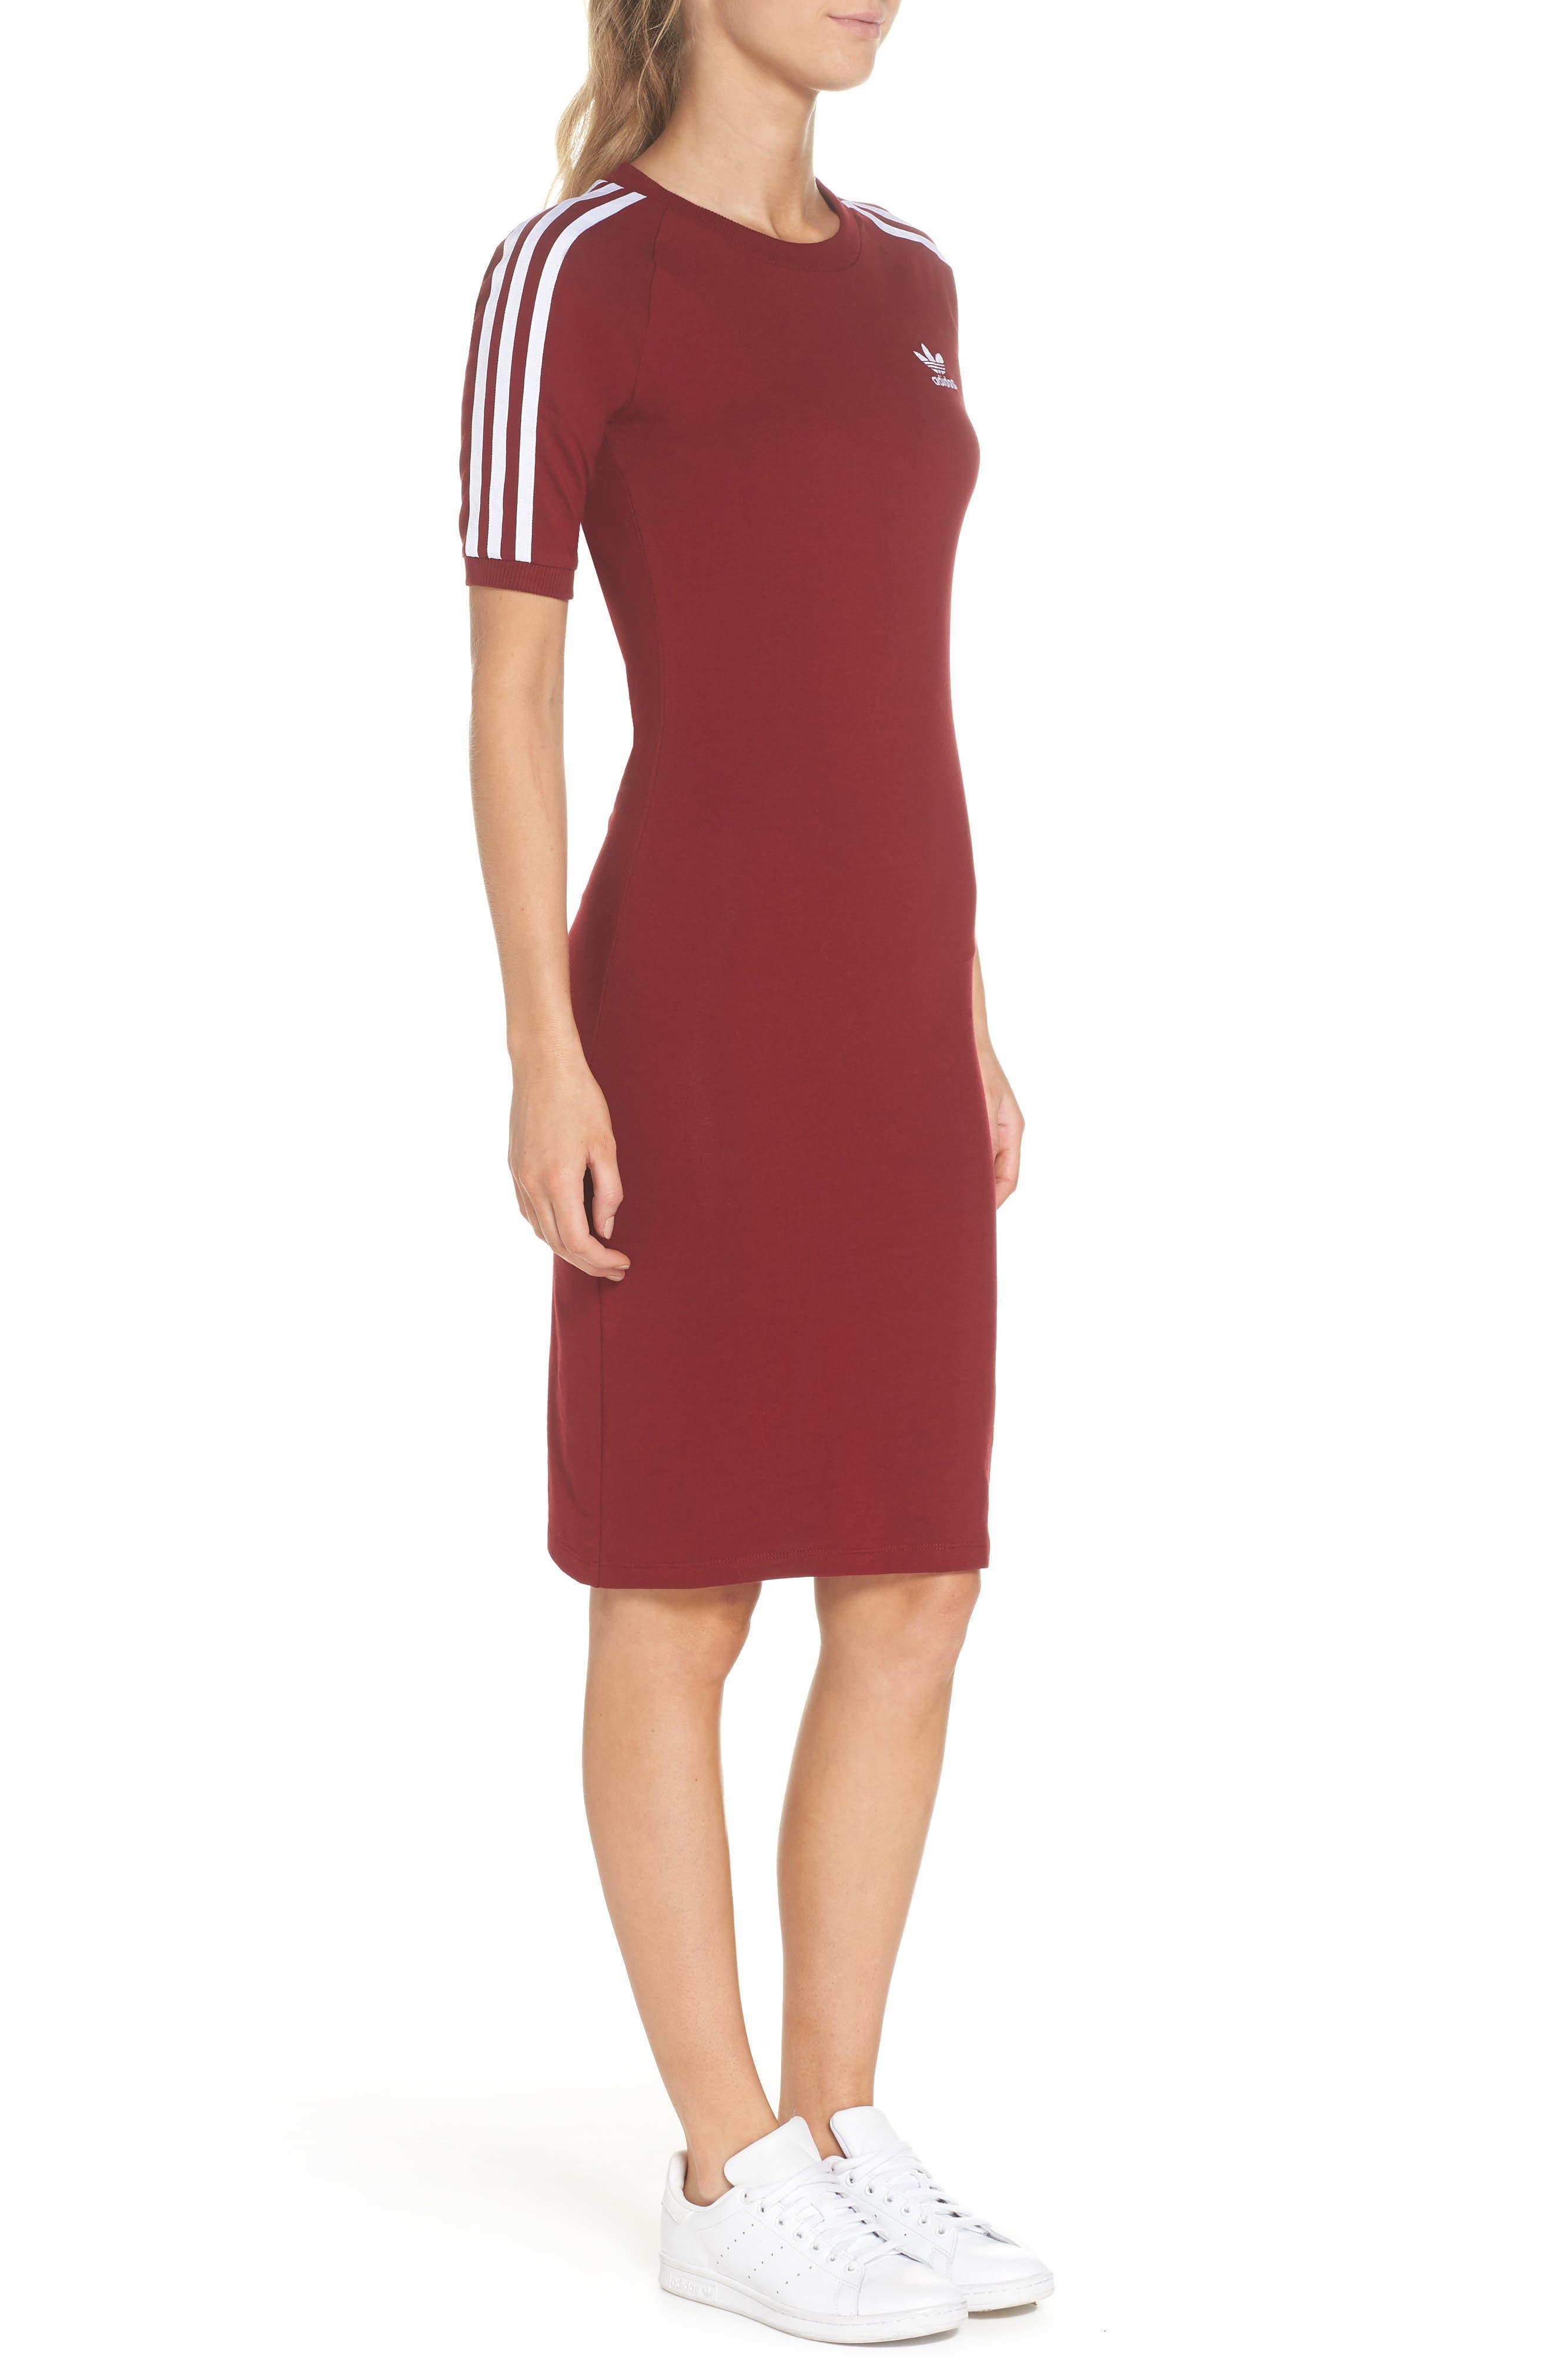 Originals 3-Stripes Dress,                             Alternate thumbnail 3, color,                             930